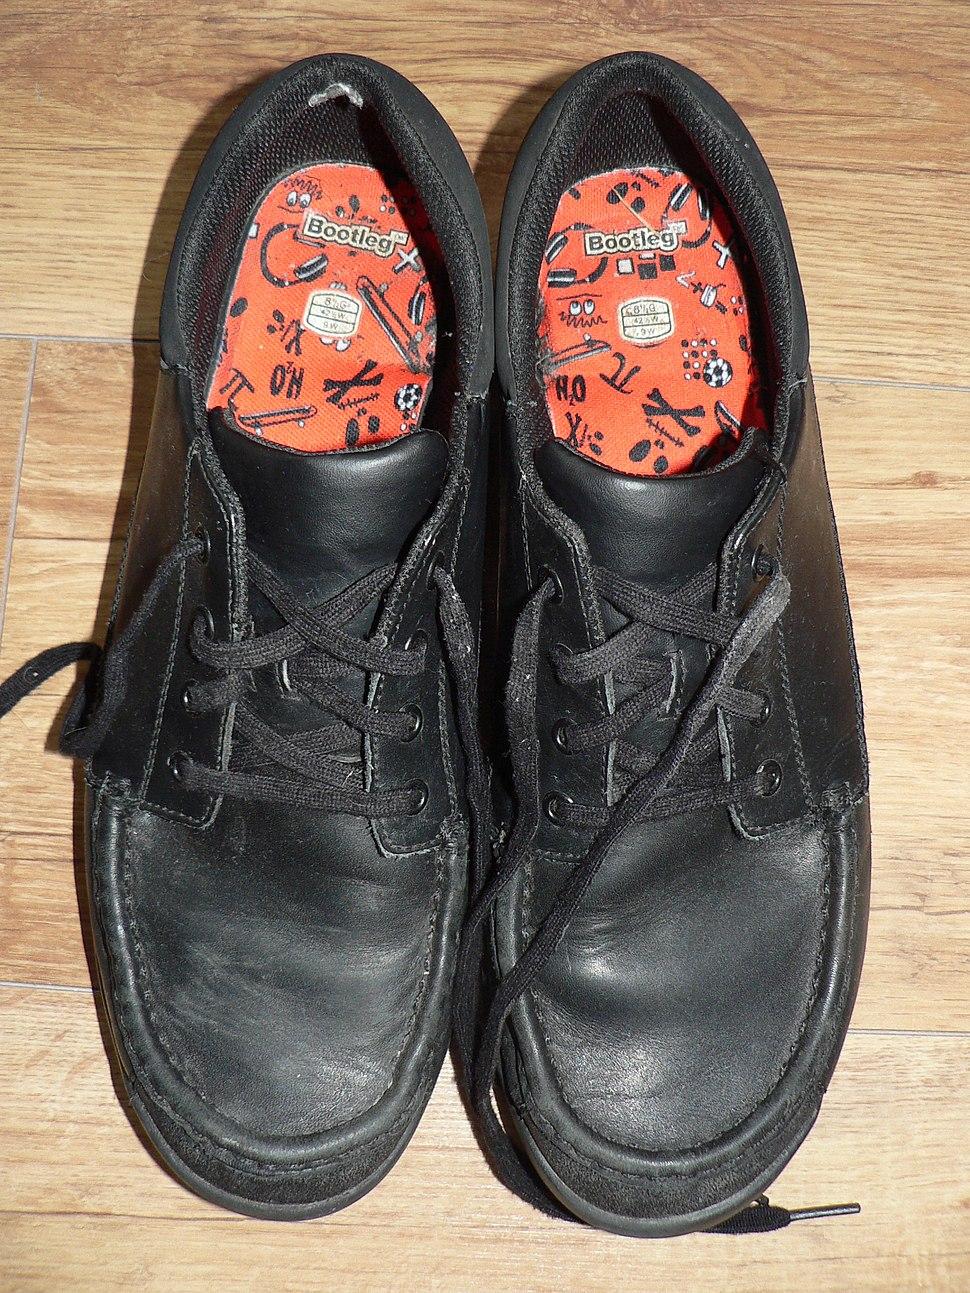 763303ac1 Clarks Bootleg School Shoes (3)